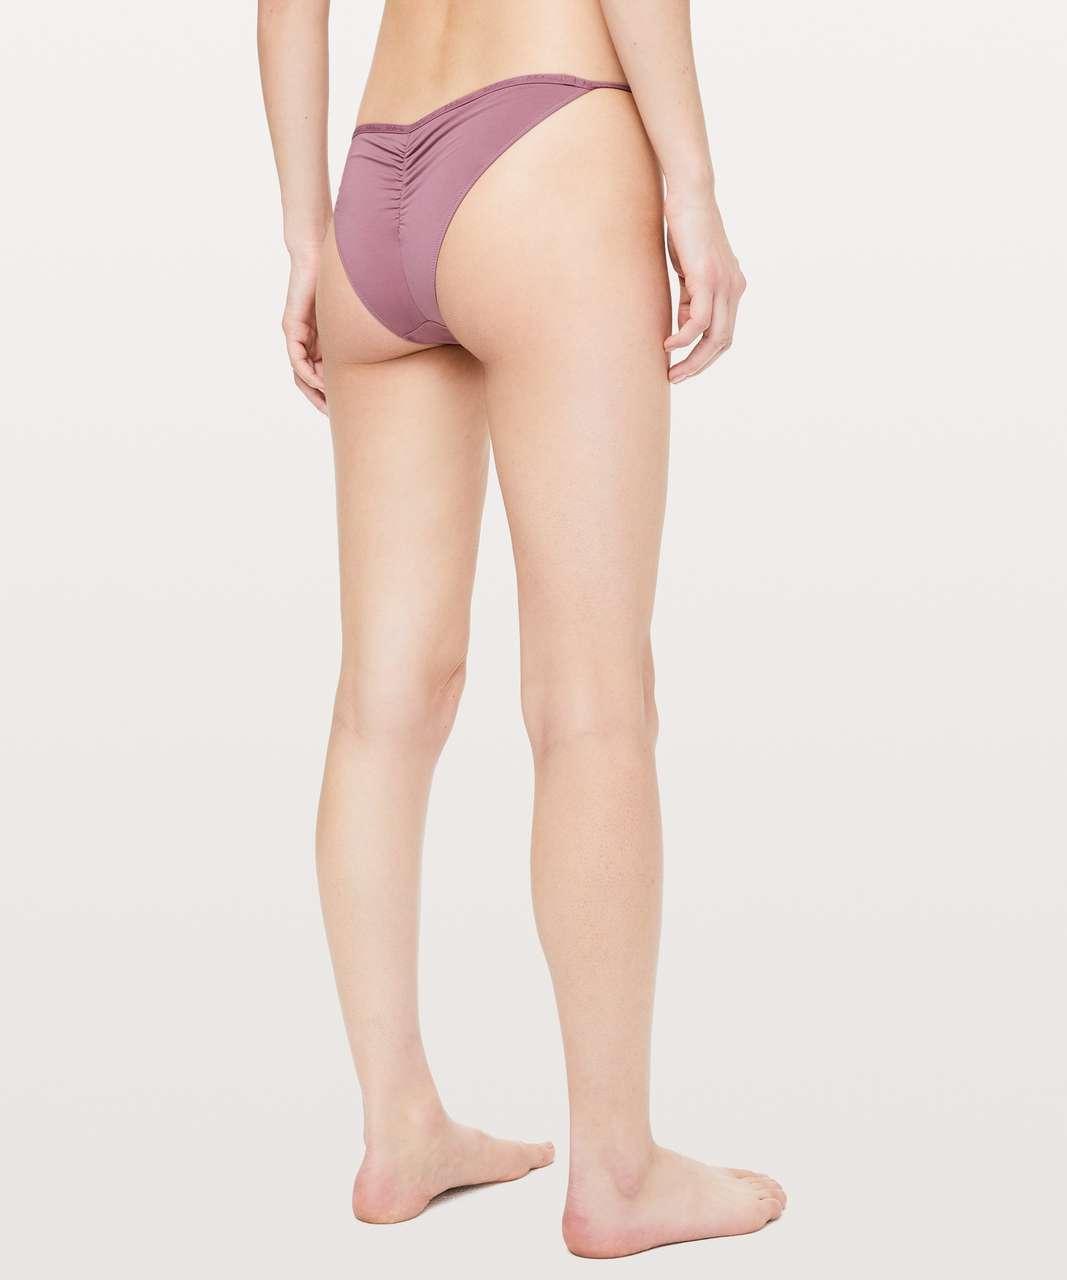 Lululemon Simply There Cheeky Bikini - Figue